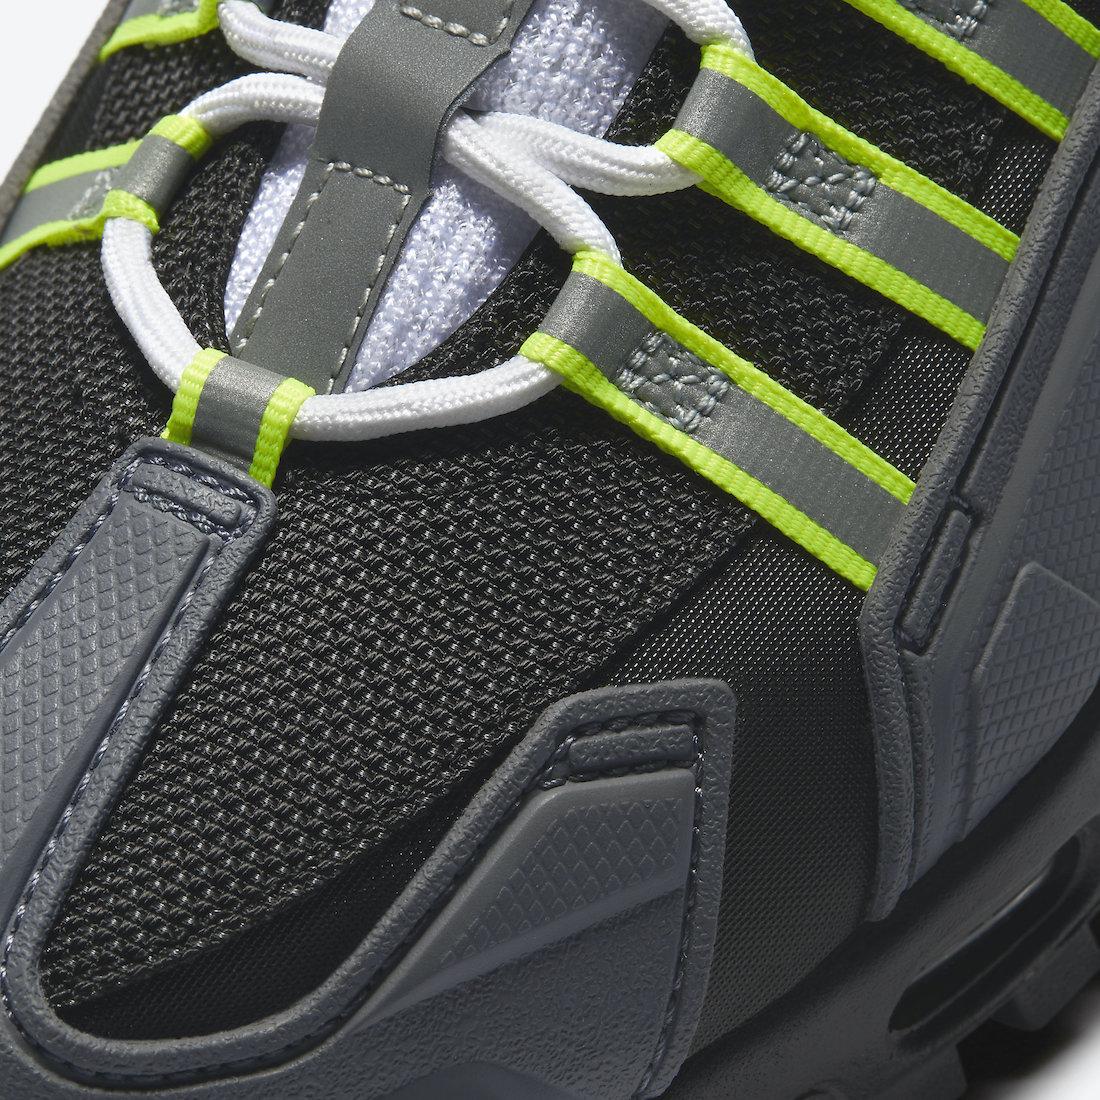 Nike-NDSTRKT-AM95-Neon-CZ3591-002-Release-Date-6